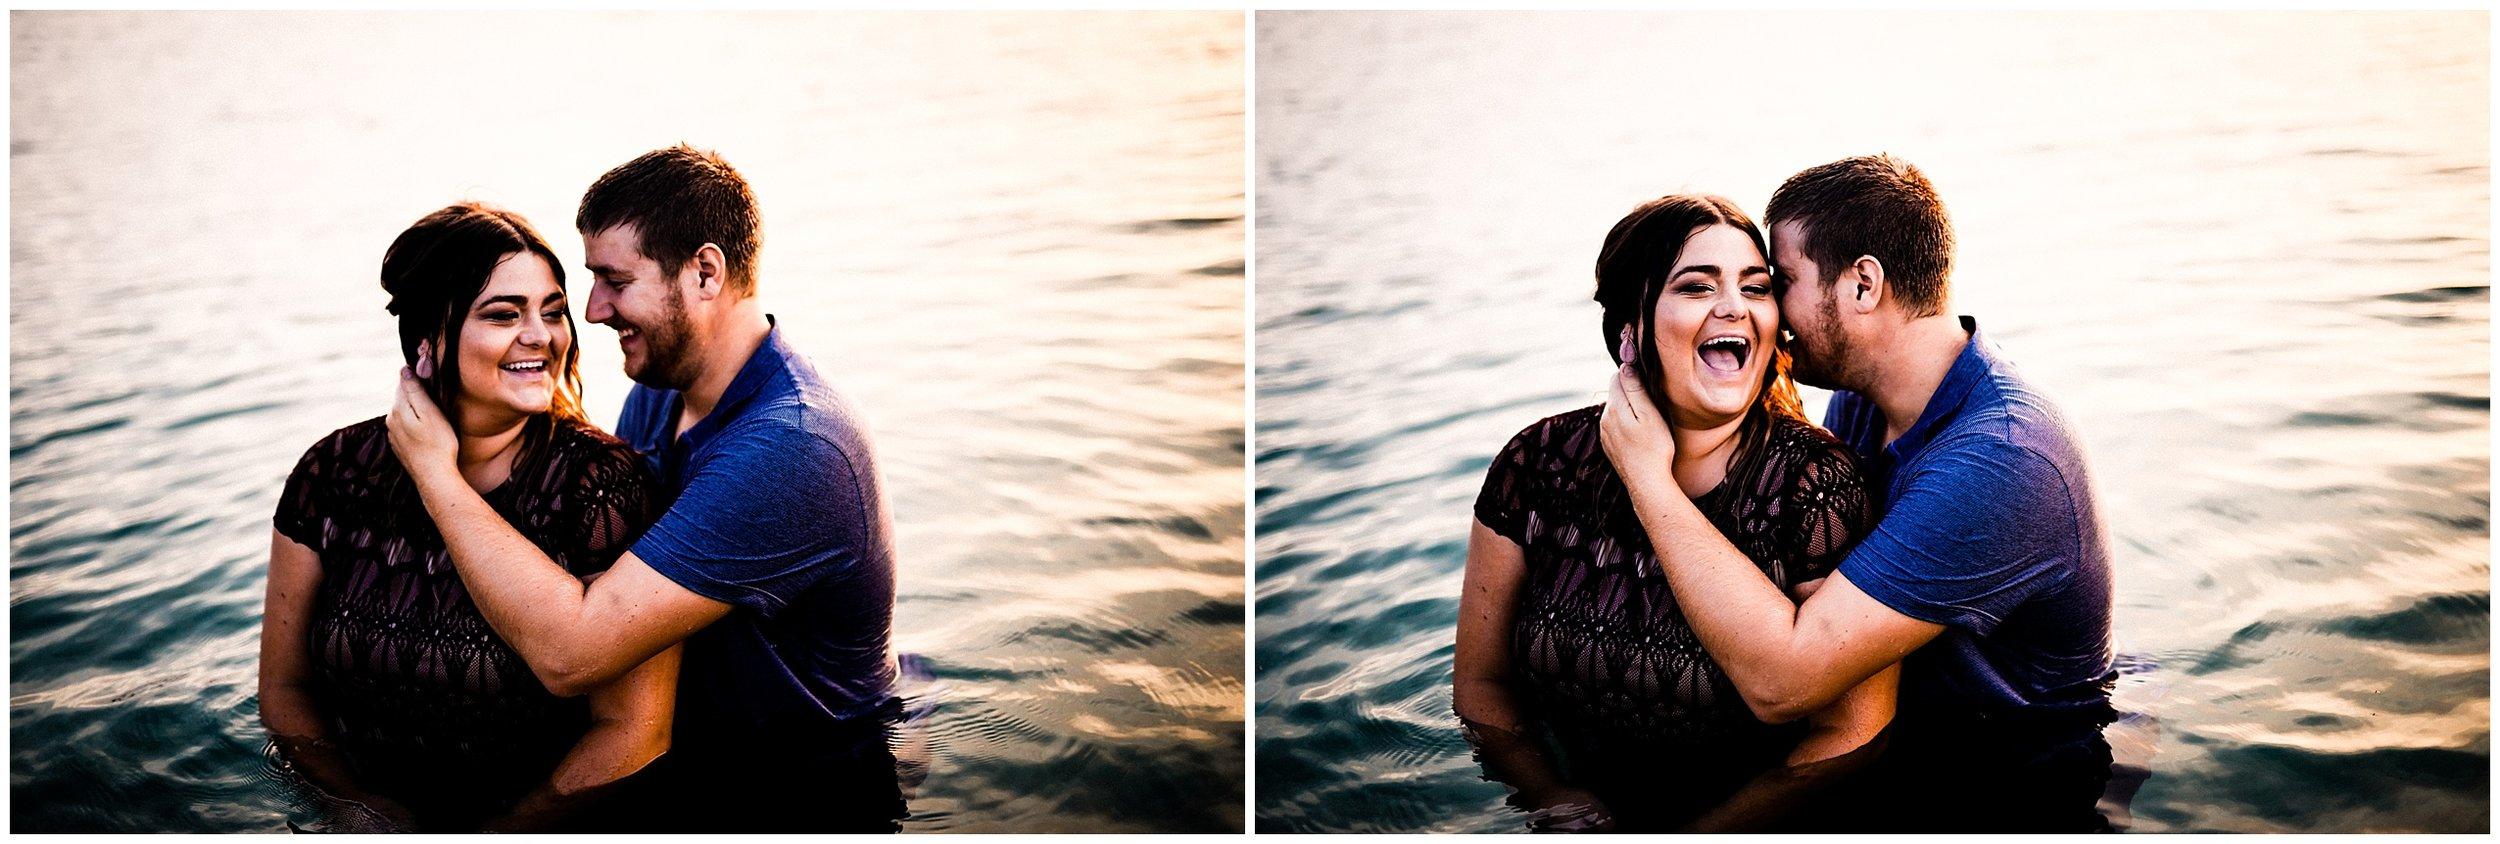 Kyle + Emily | Engaged #kyleepaigephotography_0521.jpg